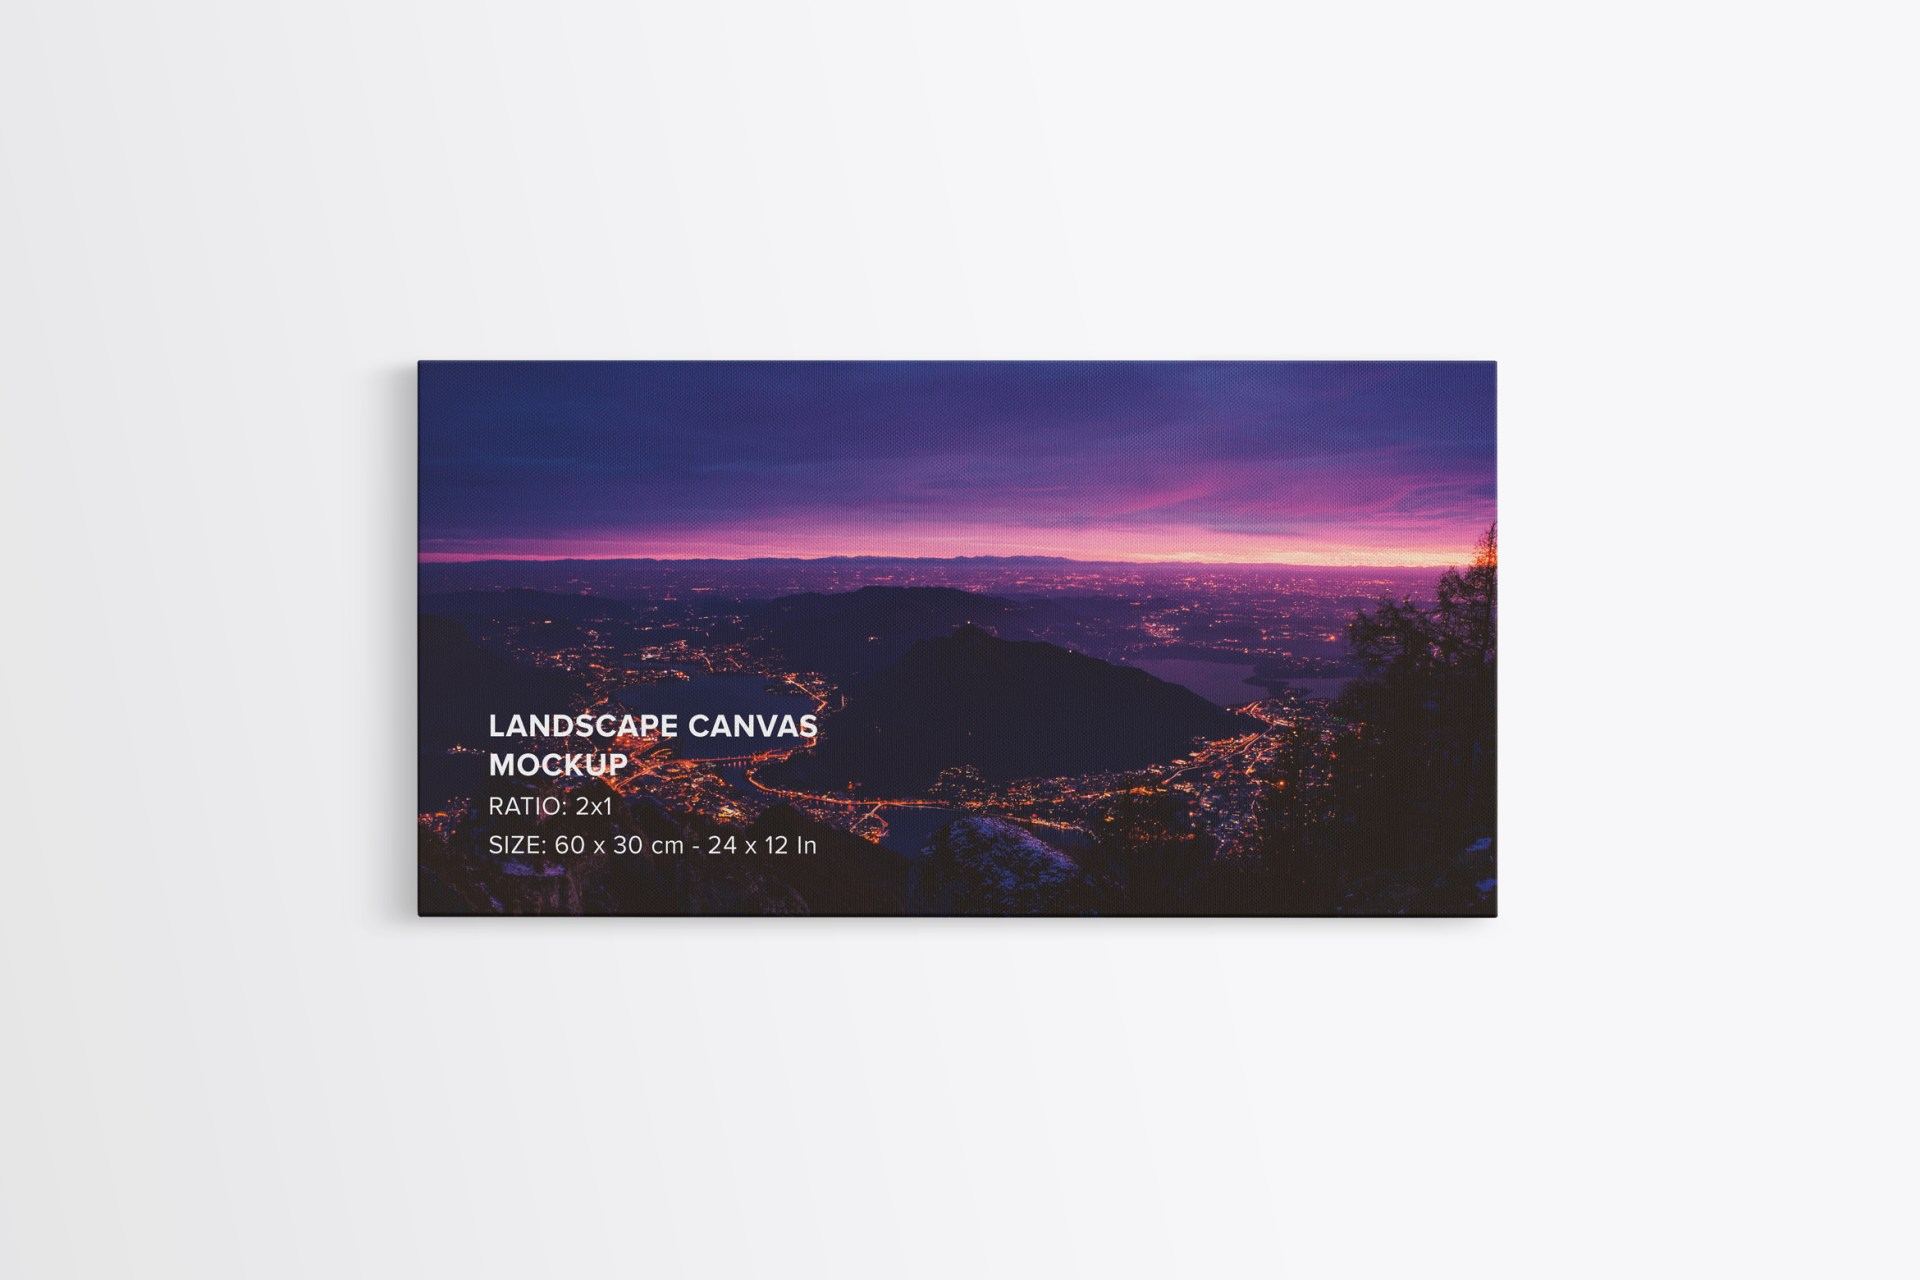 Landscape Canvas ratio 2x1 Mockup